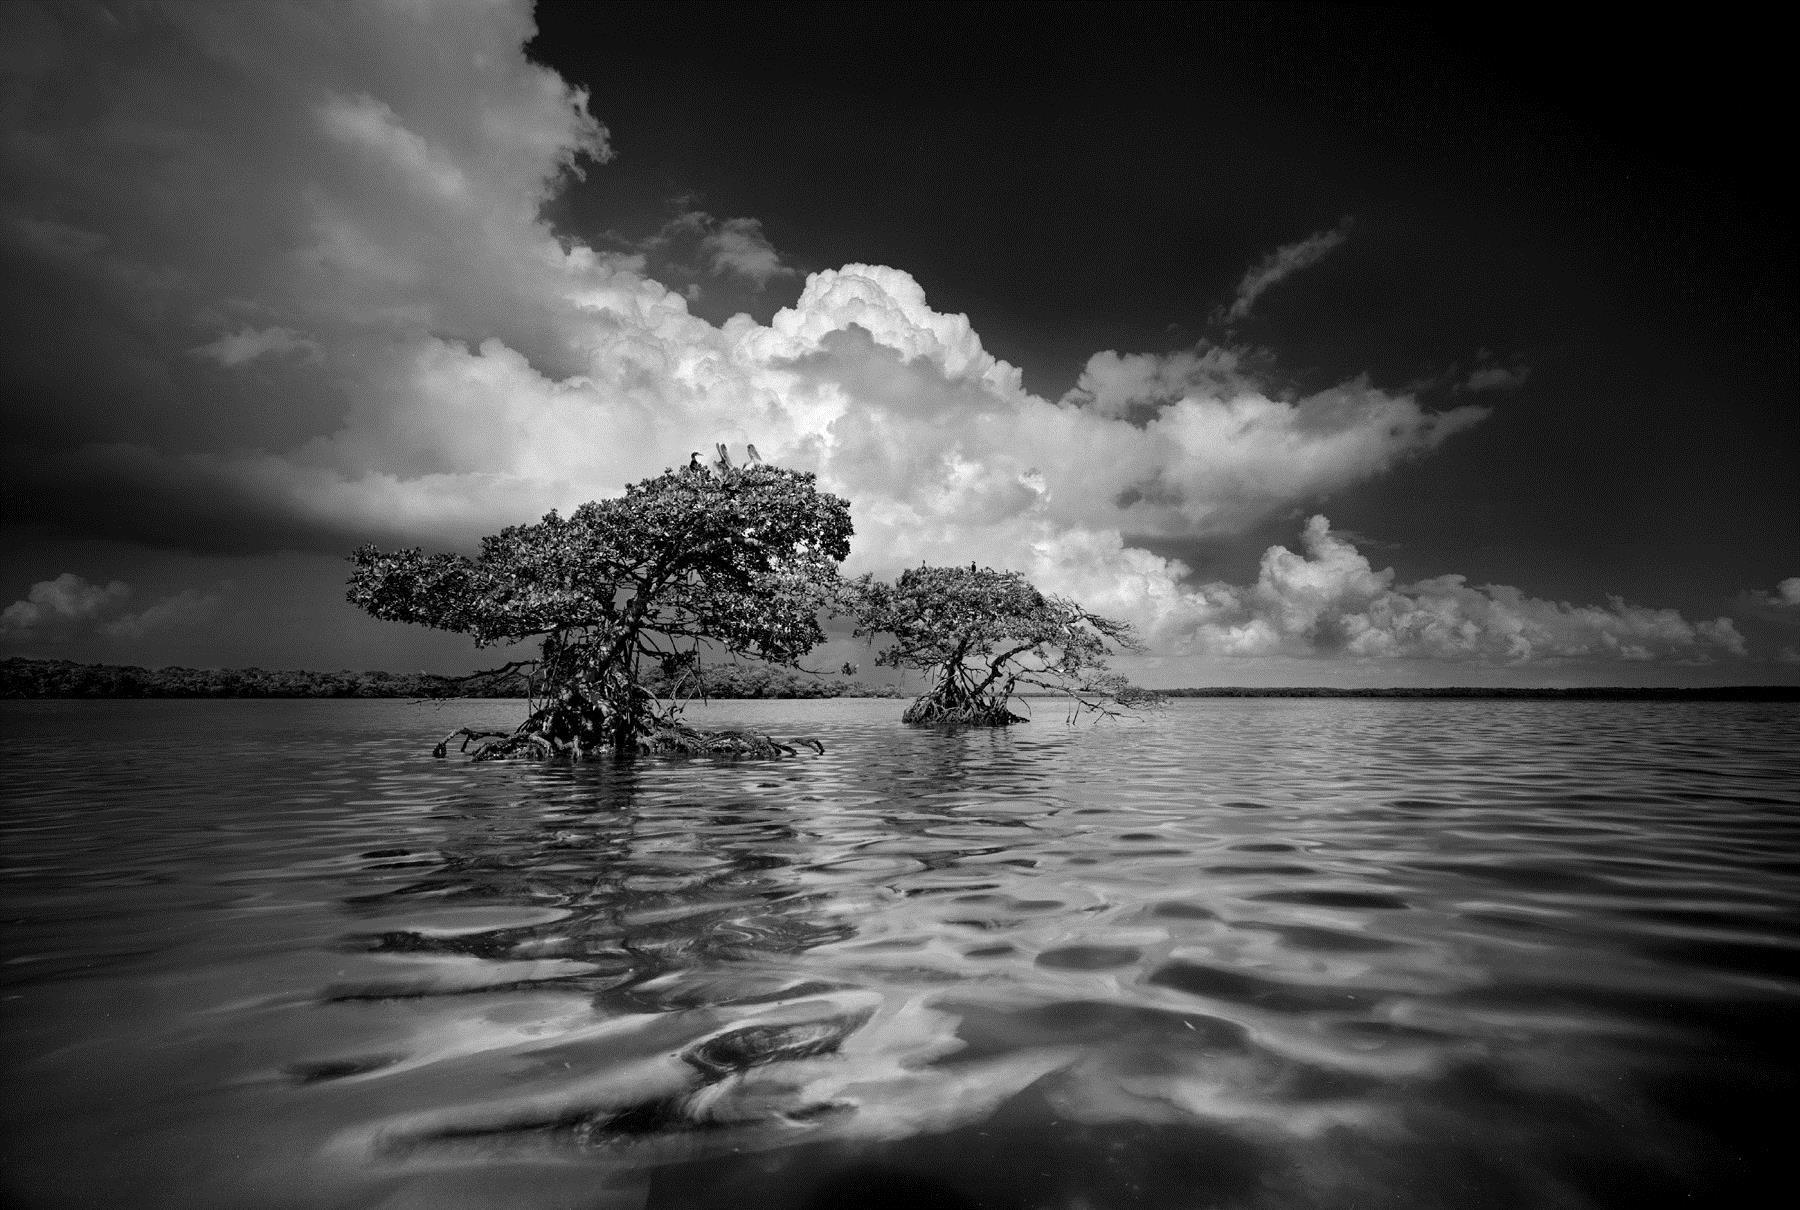 Clyde Butcher Photographs And Prints Artswfl Com